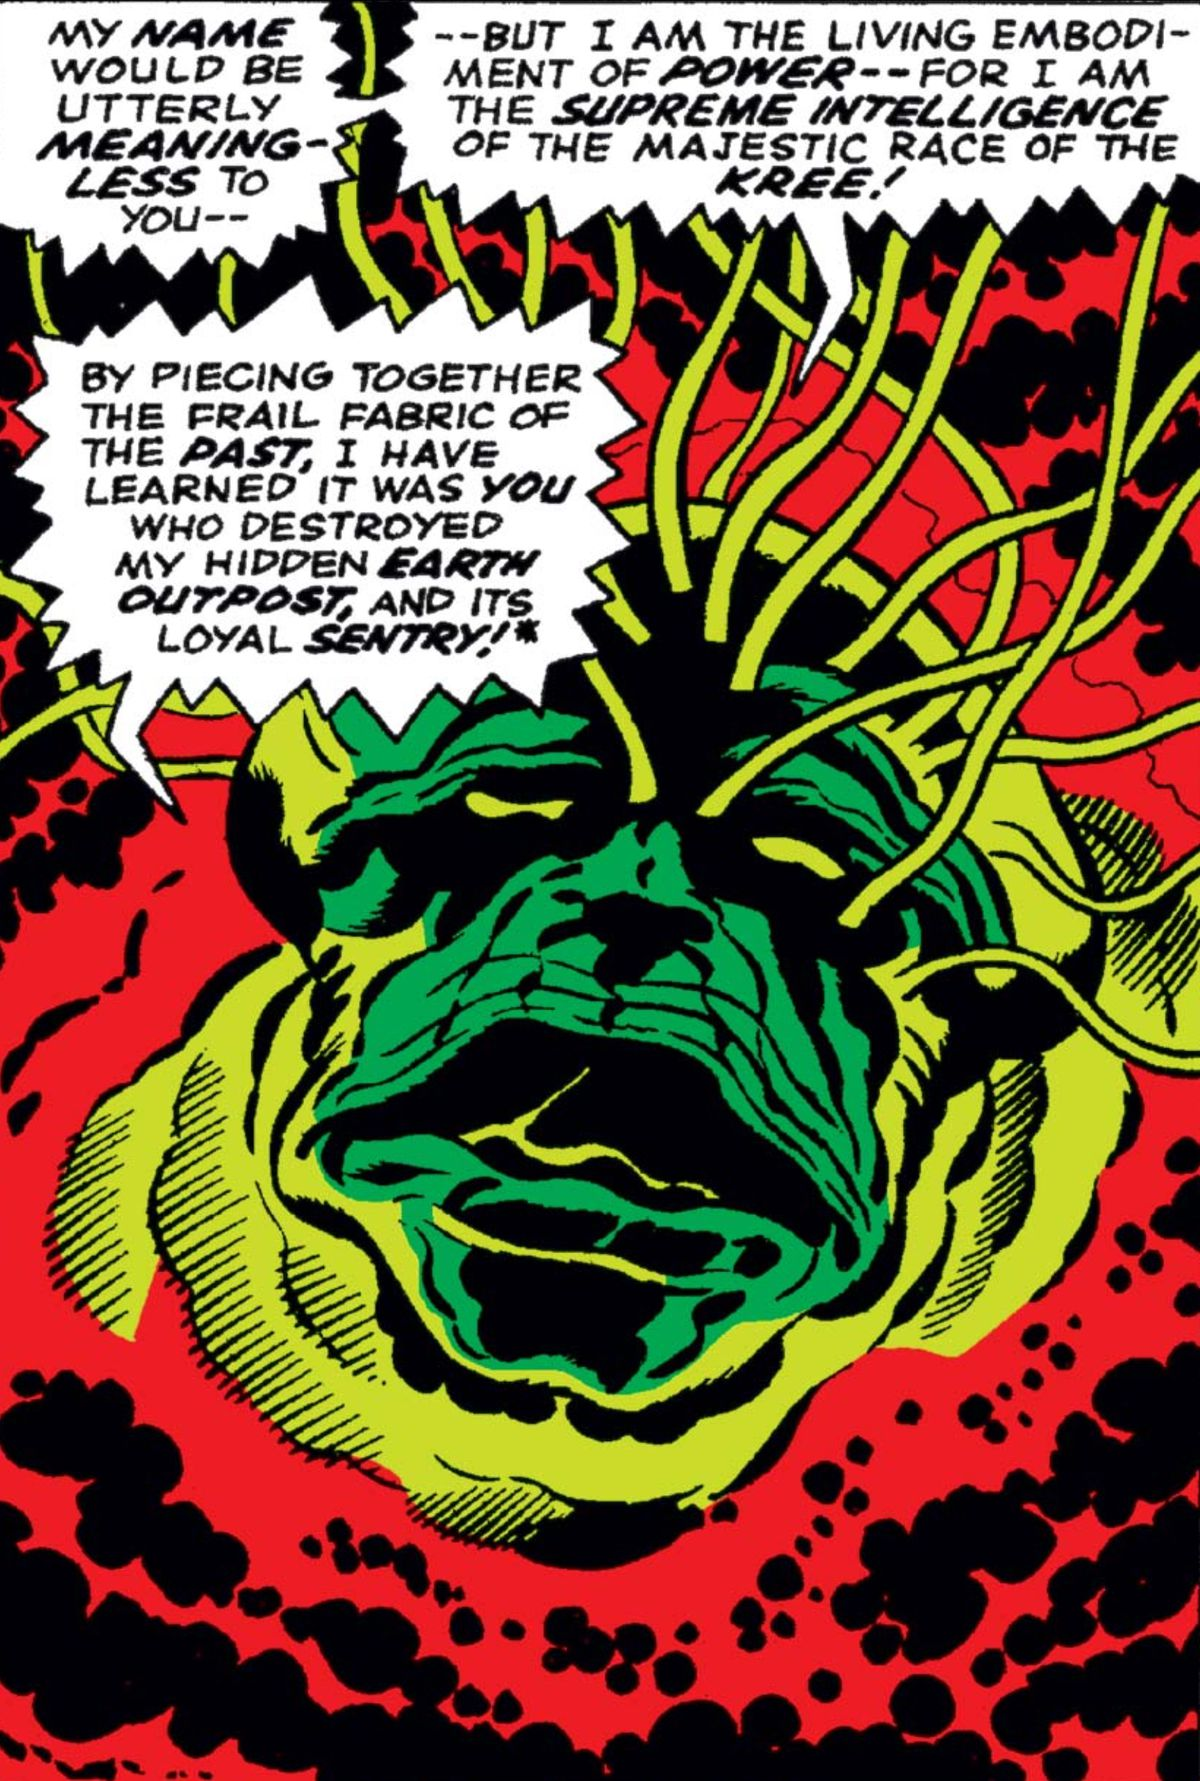 The Kree Supreme Intelligence, Fantastic Four #65, Marvel Comics (1967).